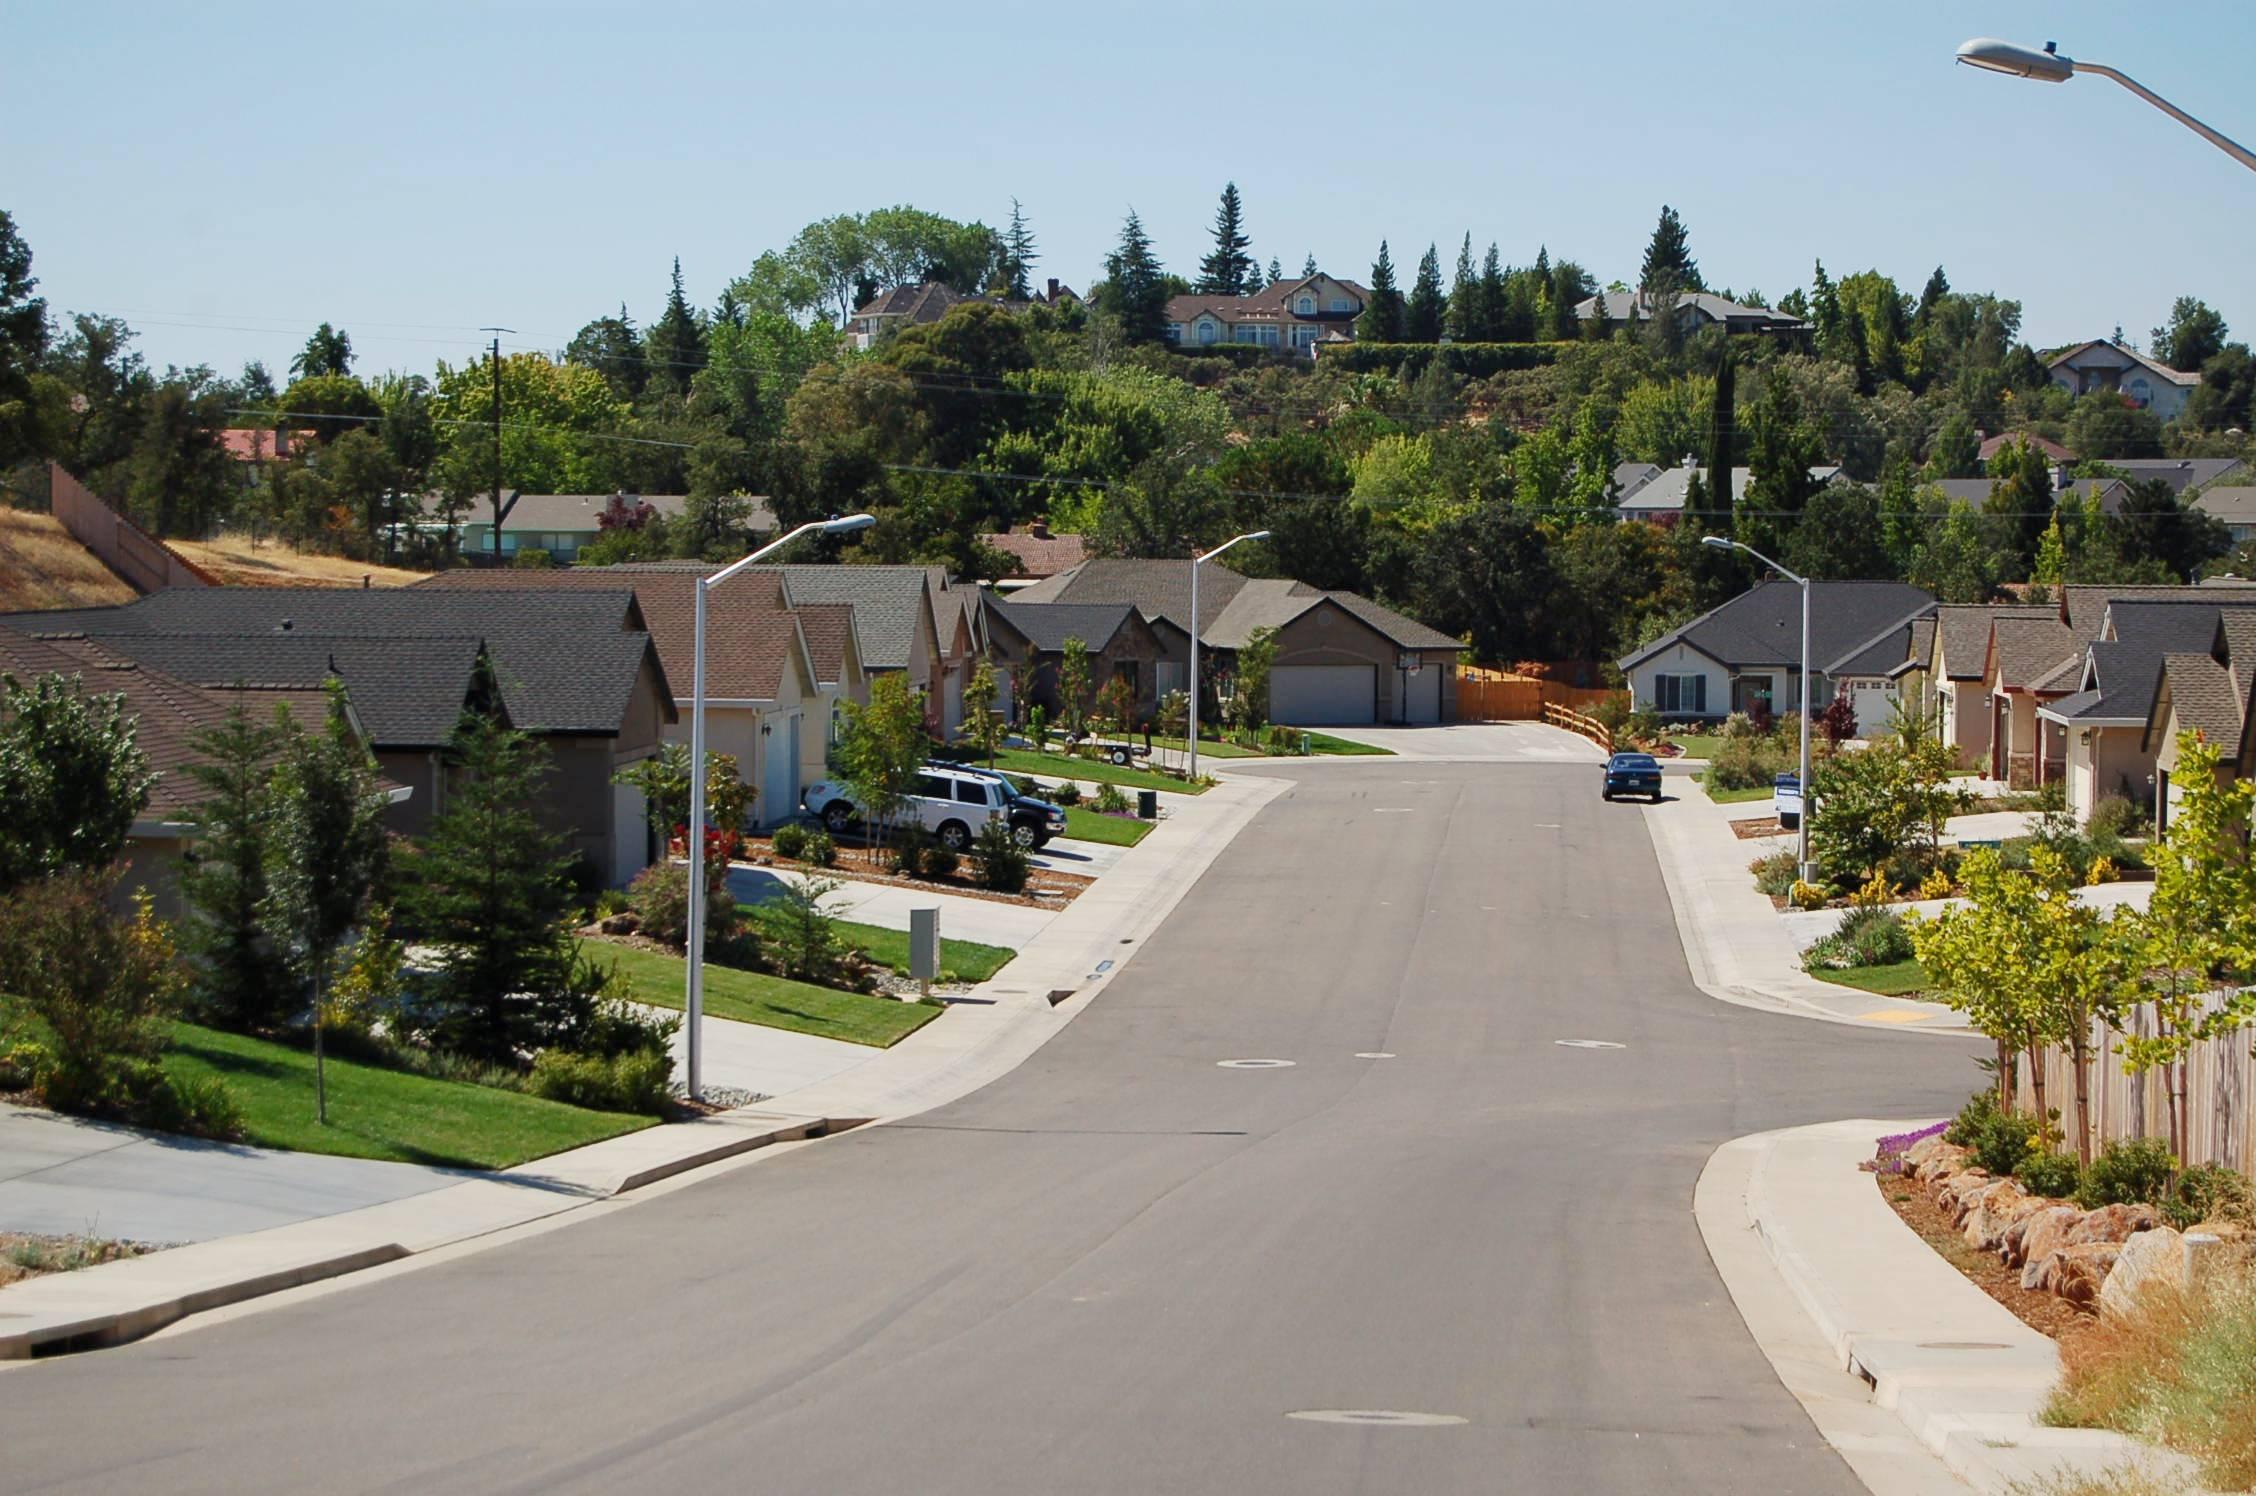 Lakeside Subdivision Streetview